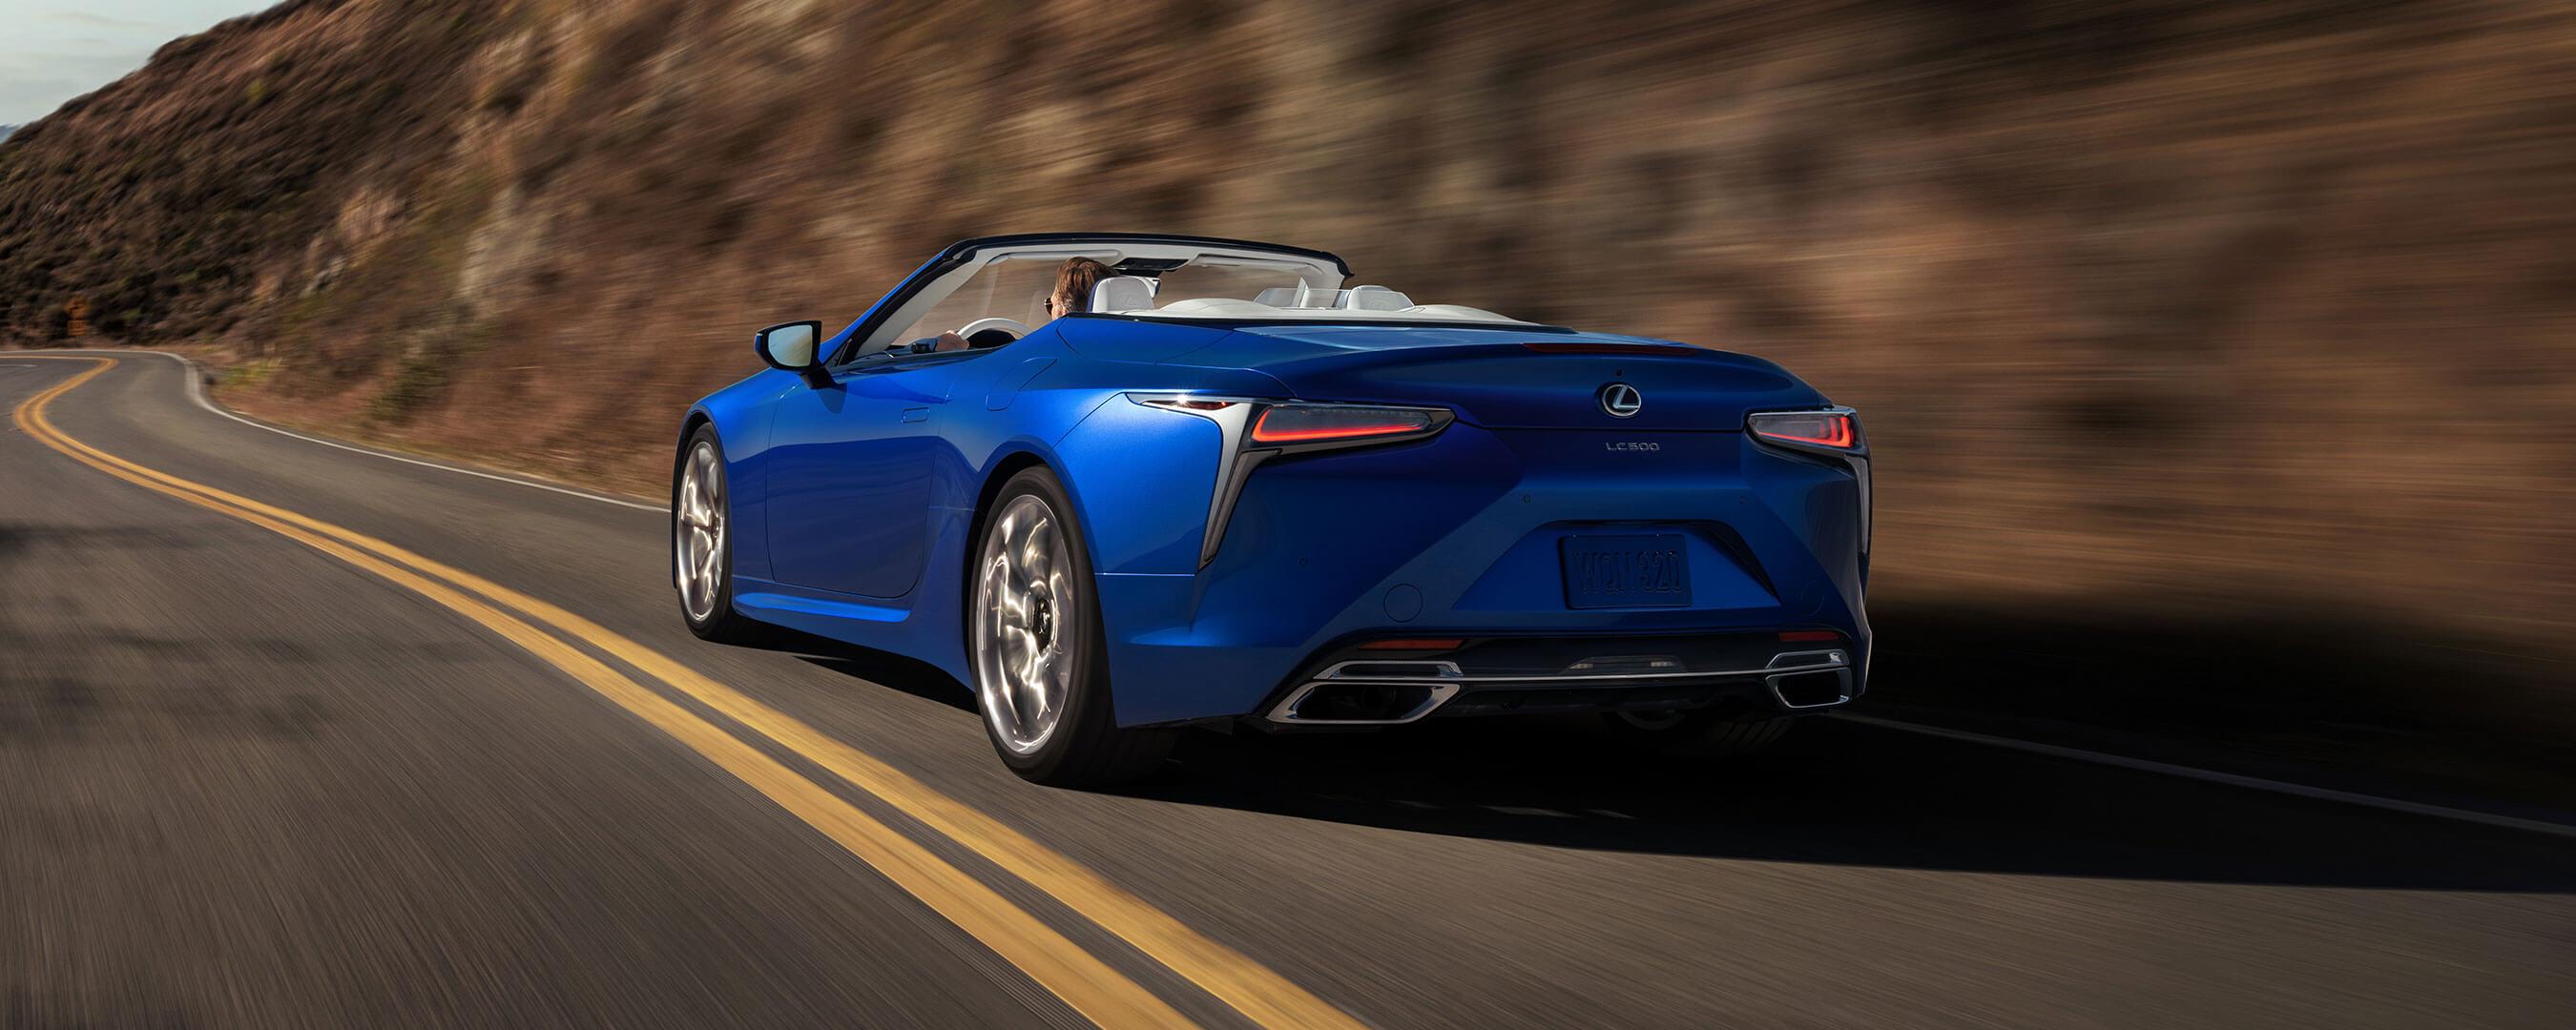 2020 lexus lc convertible experience exterior back